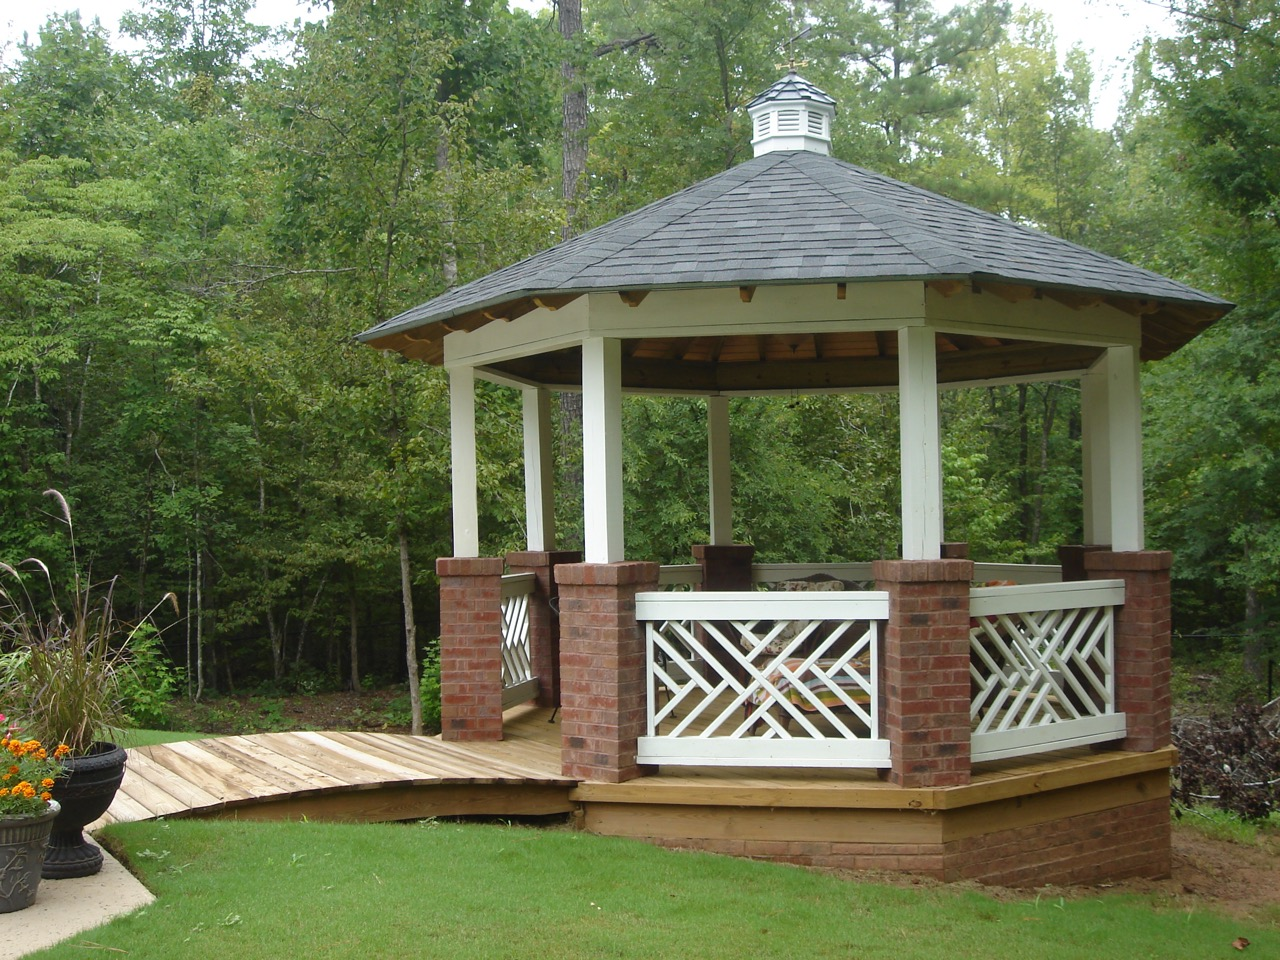 How To Add Backyard Shade by Archadeck | St. Louis decks ... on Open Backyard Ideas id=93111